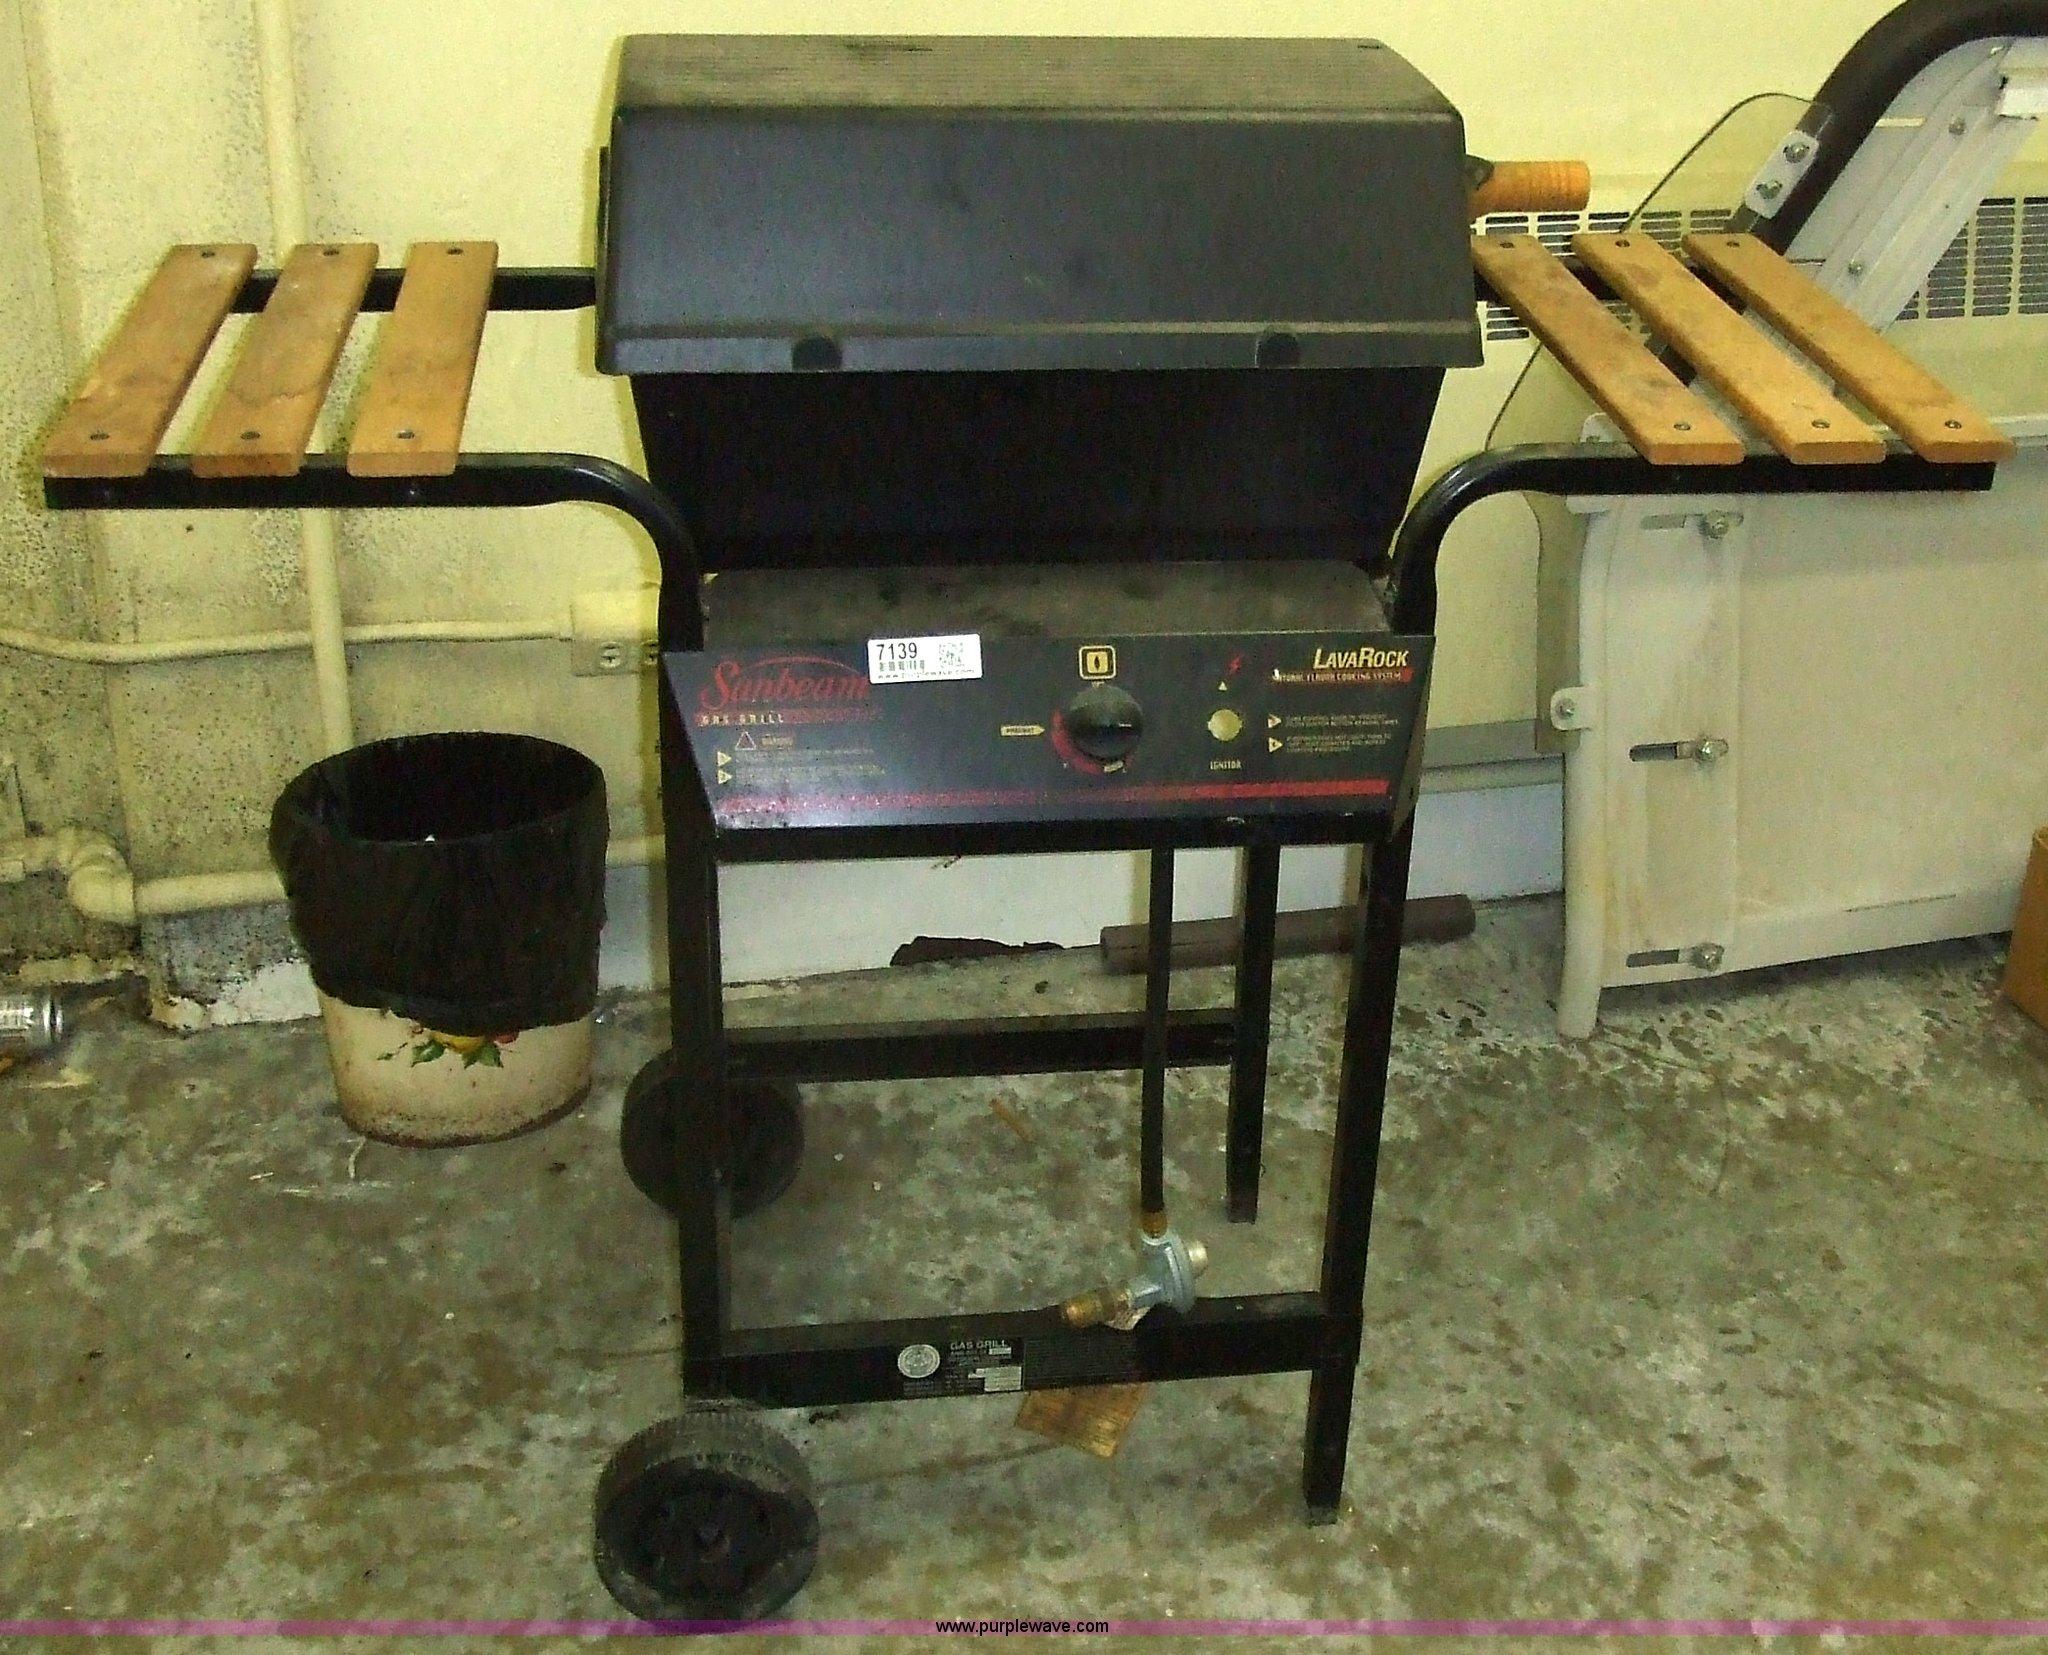 sunbeam gas grill with lava rocks | item 7139 | sold! septem